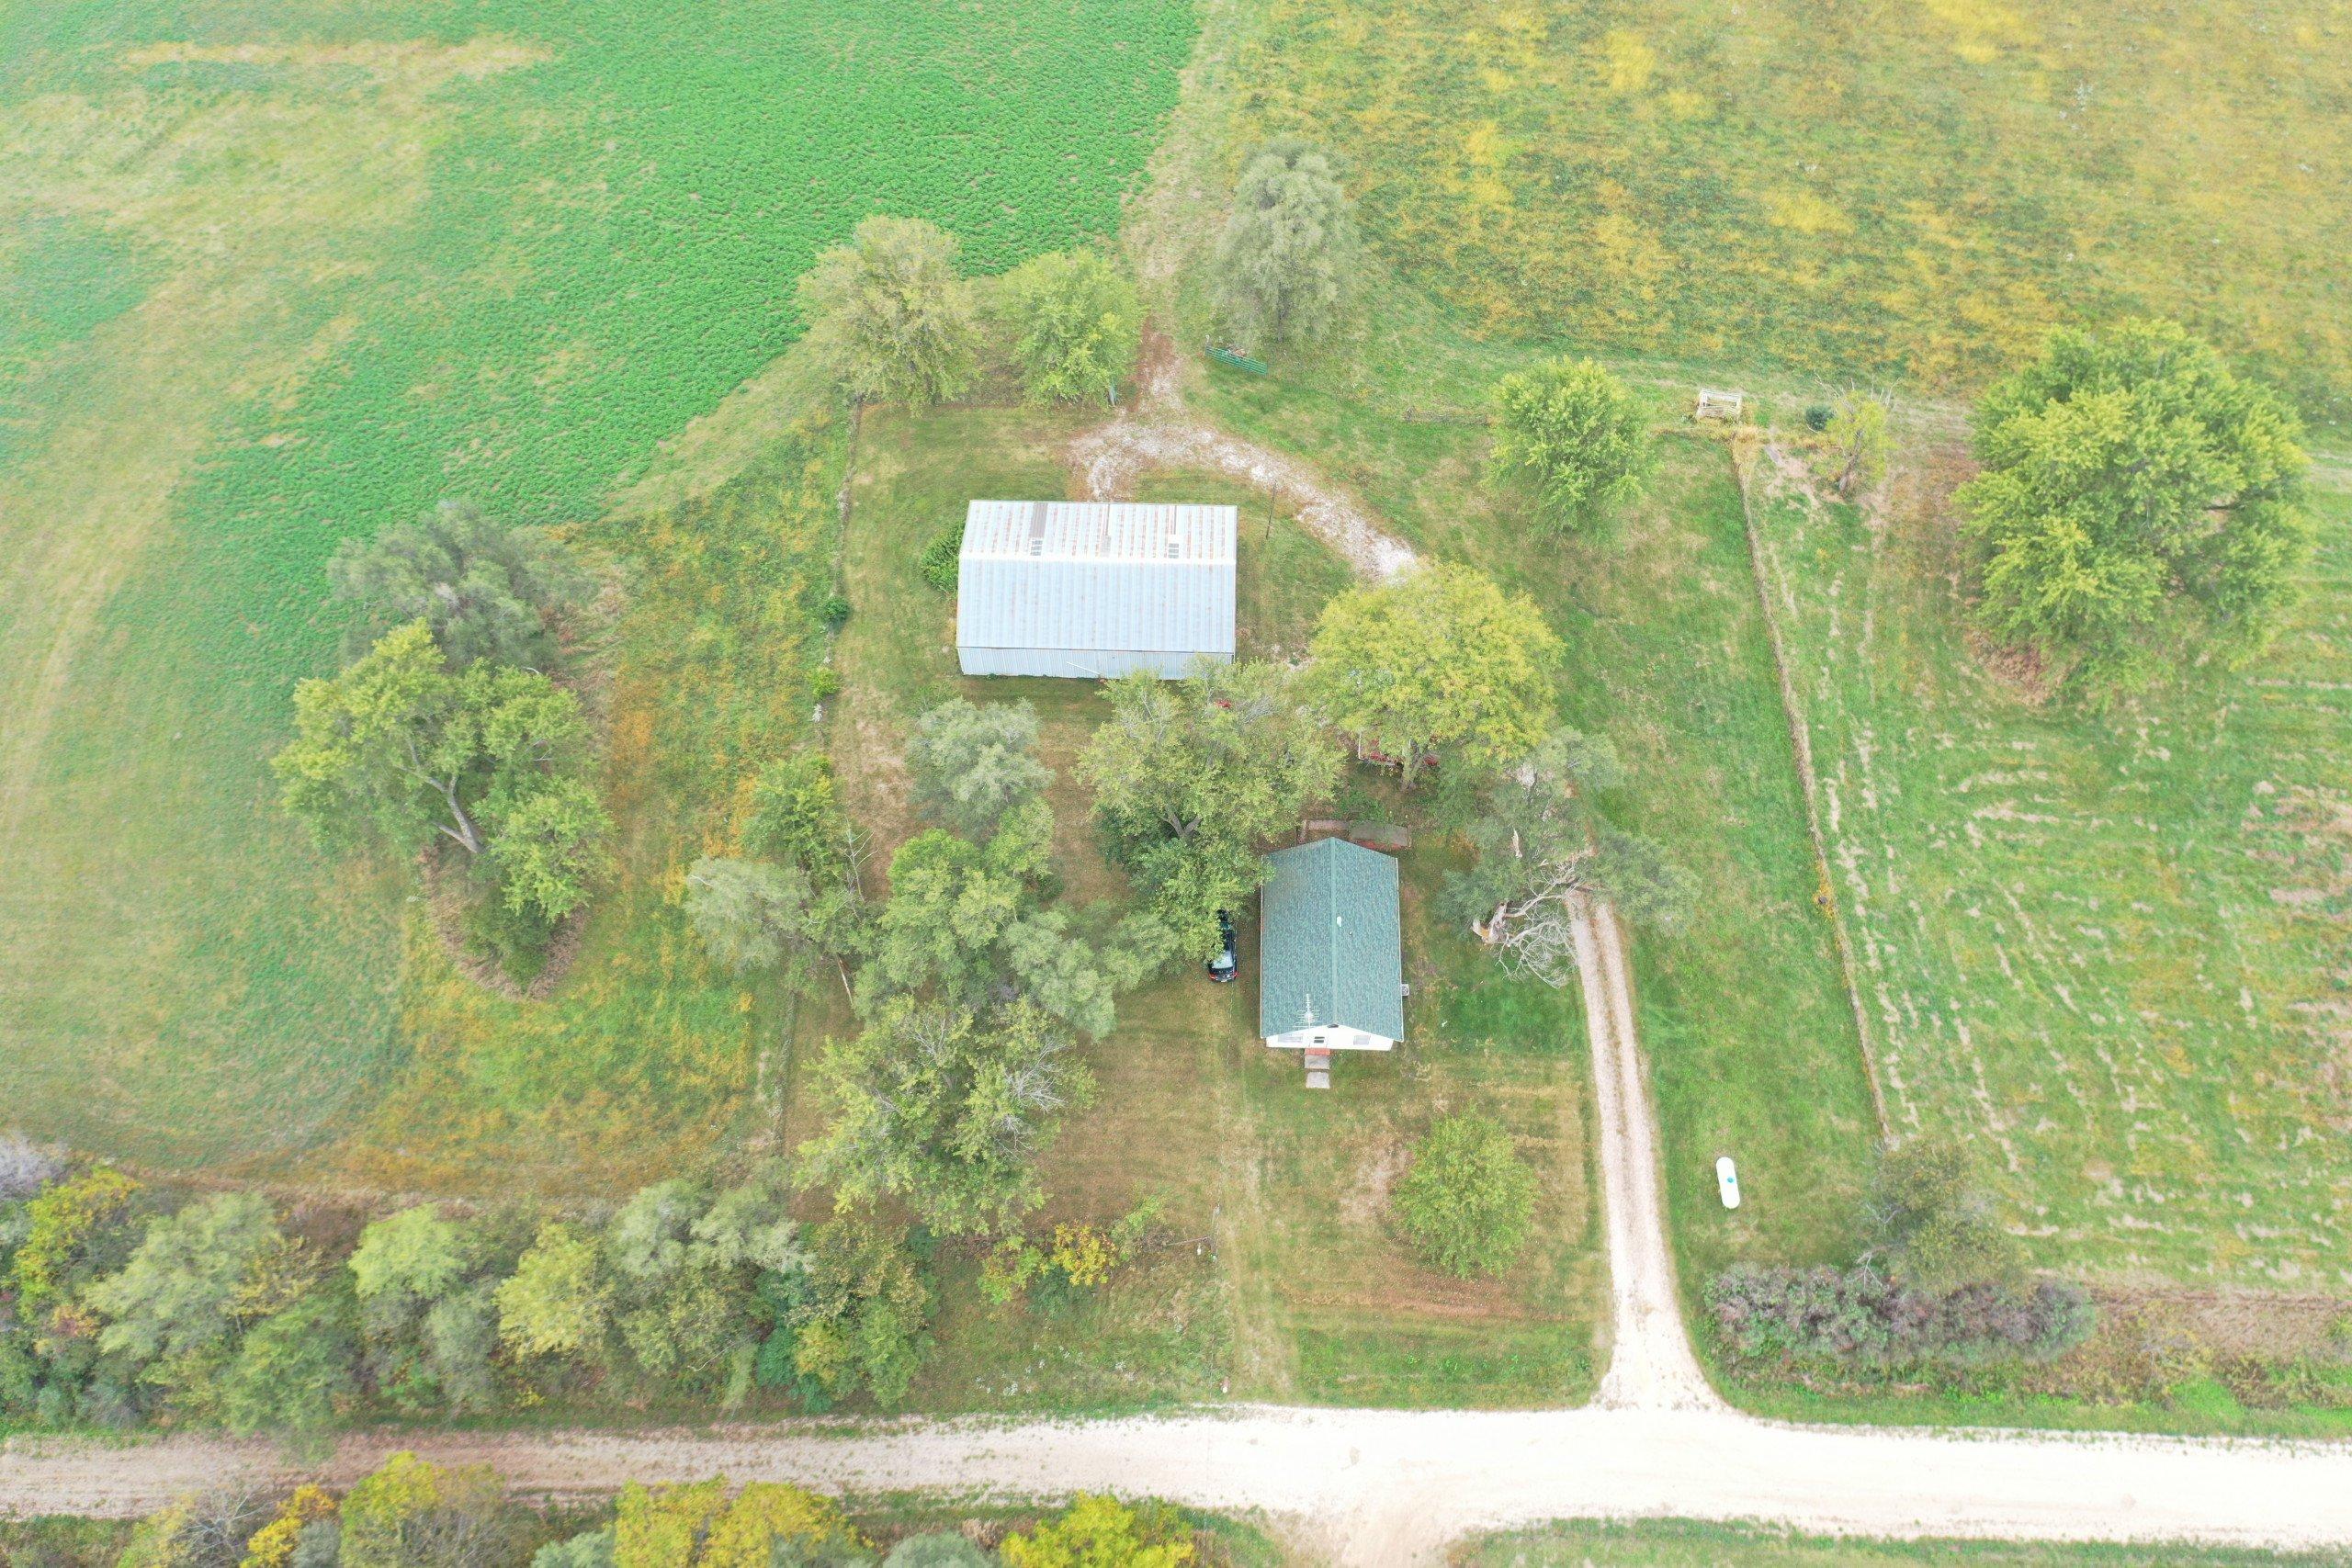 land-warren-county-iowa-200-acres-listing-number-15810-DJI_0565-0.jpg